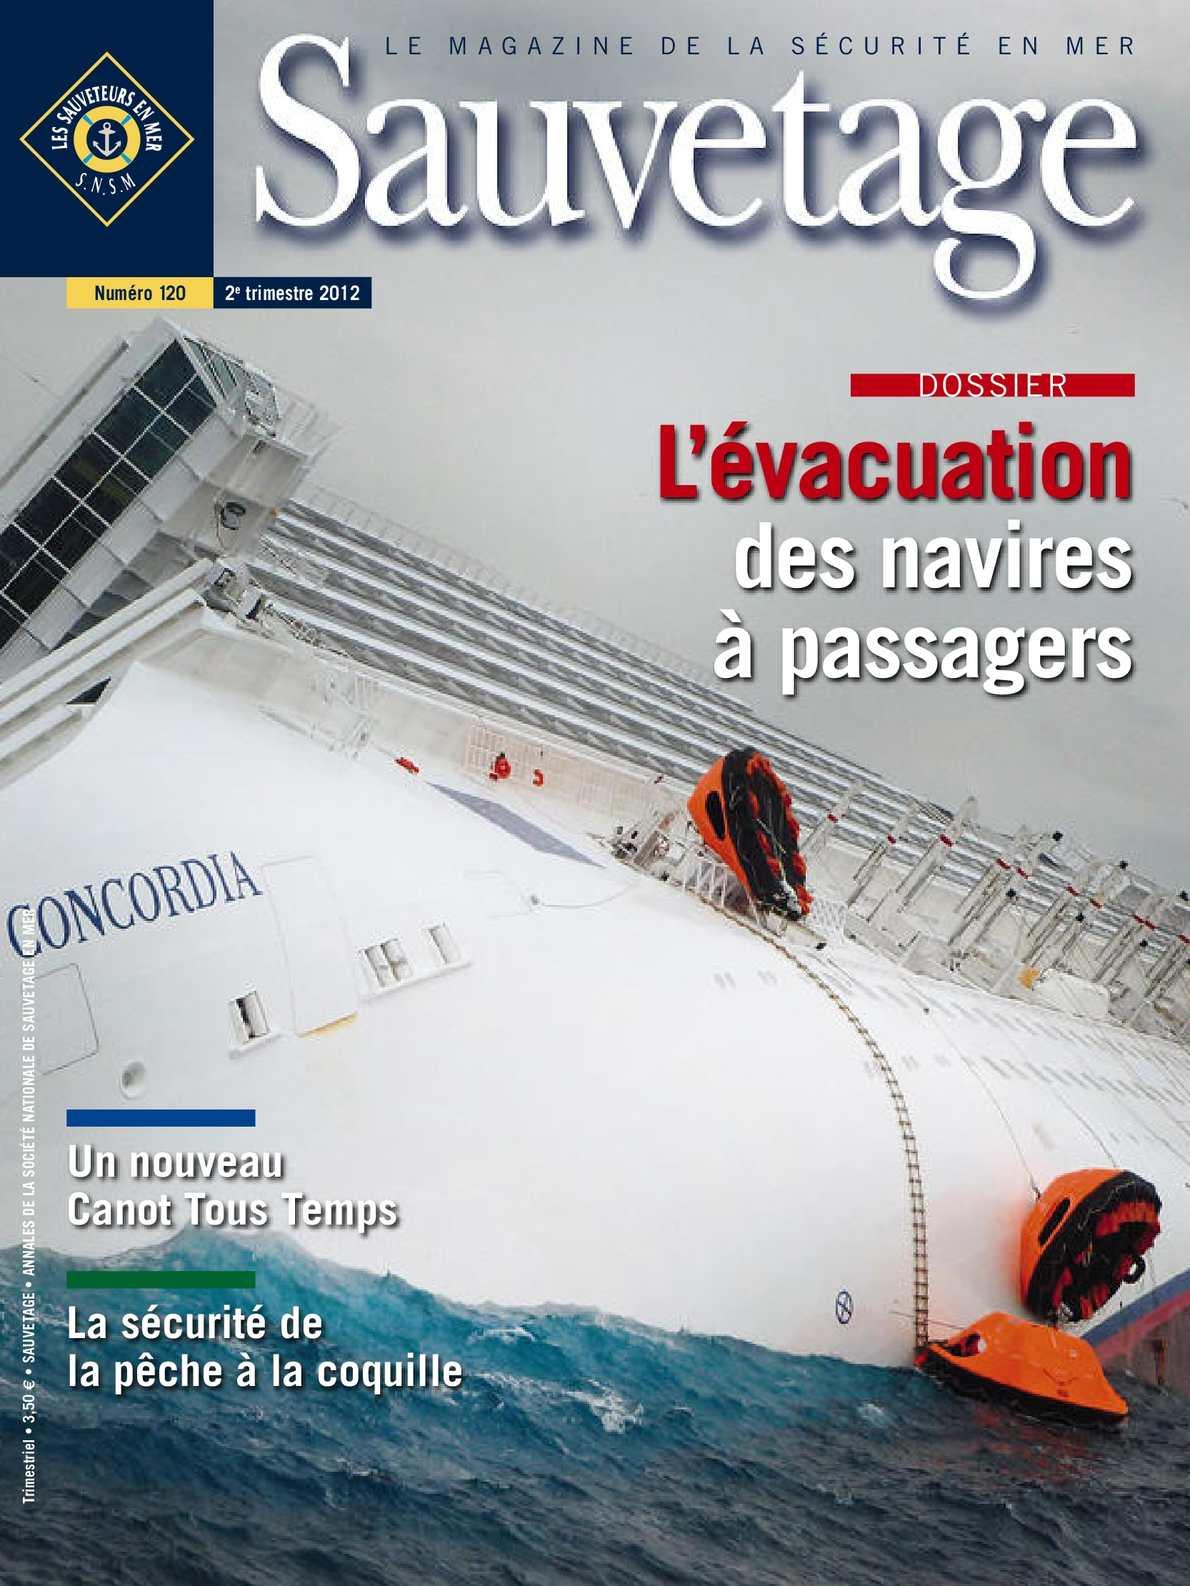 c86ae47f472 Calaméo - Magazine Sauvetage N°120